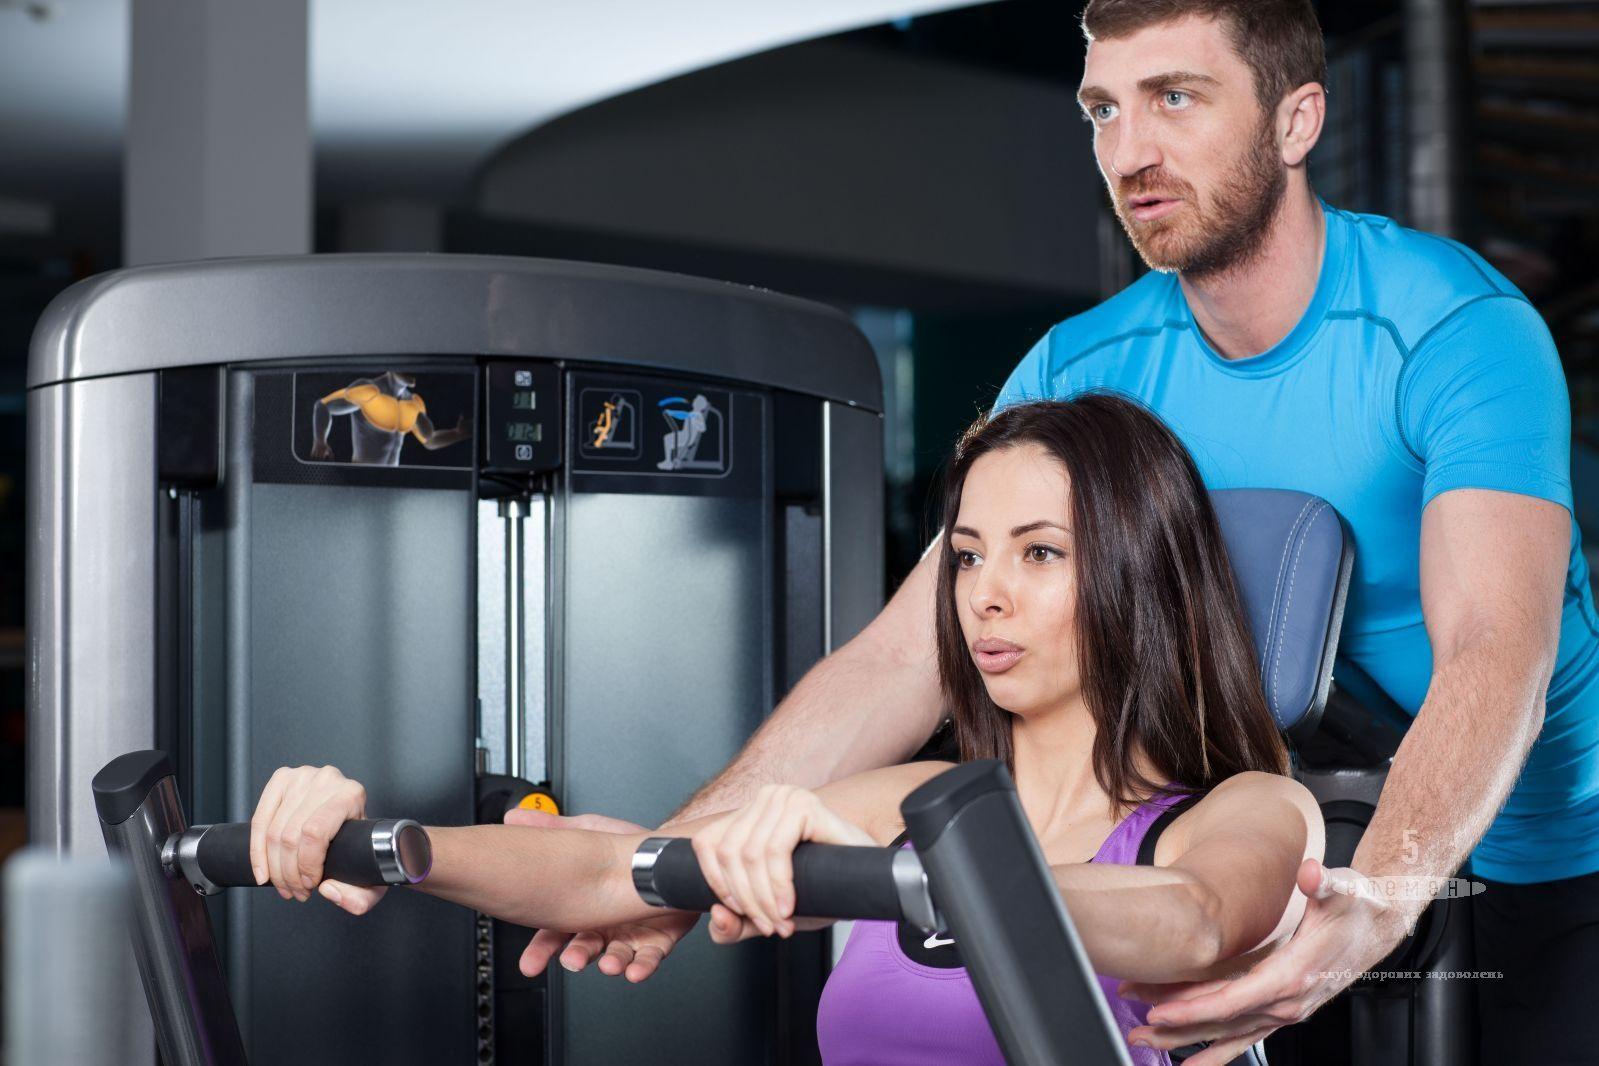 Вправи на тренажерах під наглядом гарного тренера